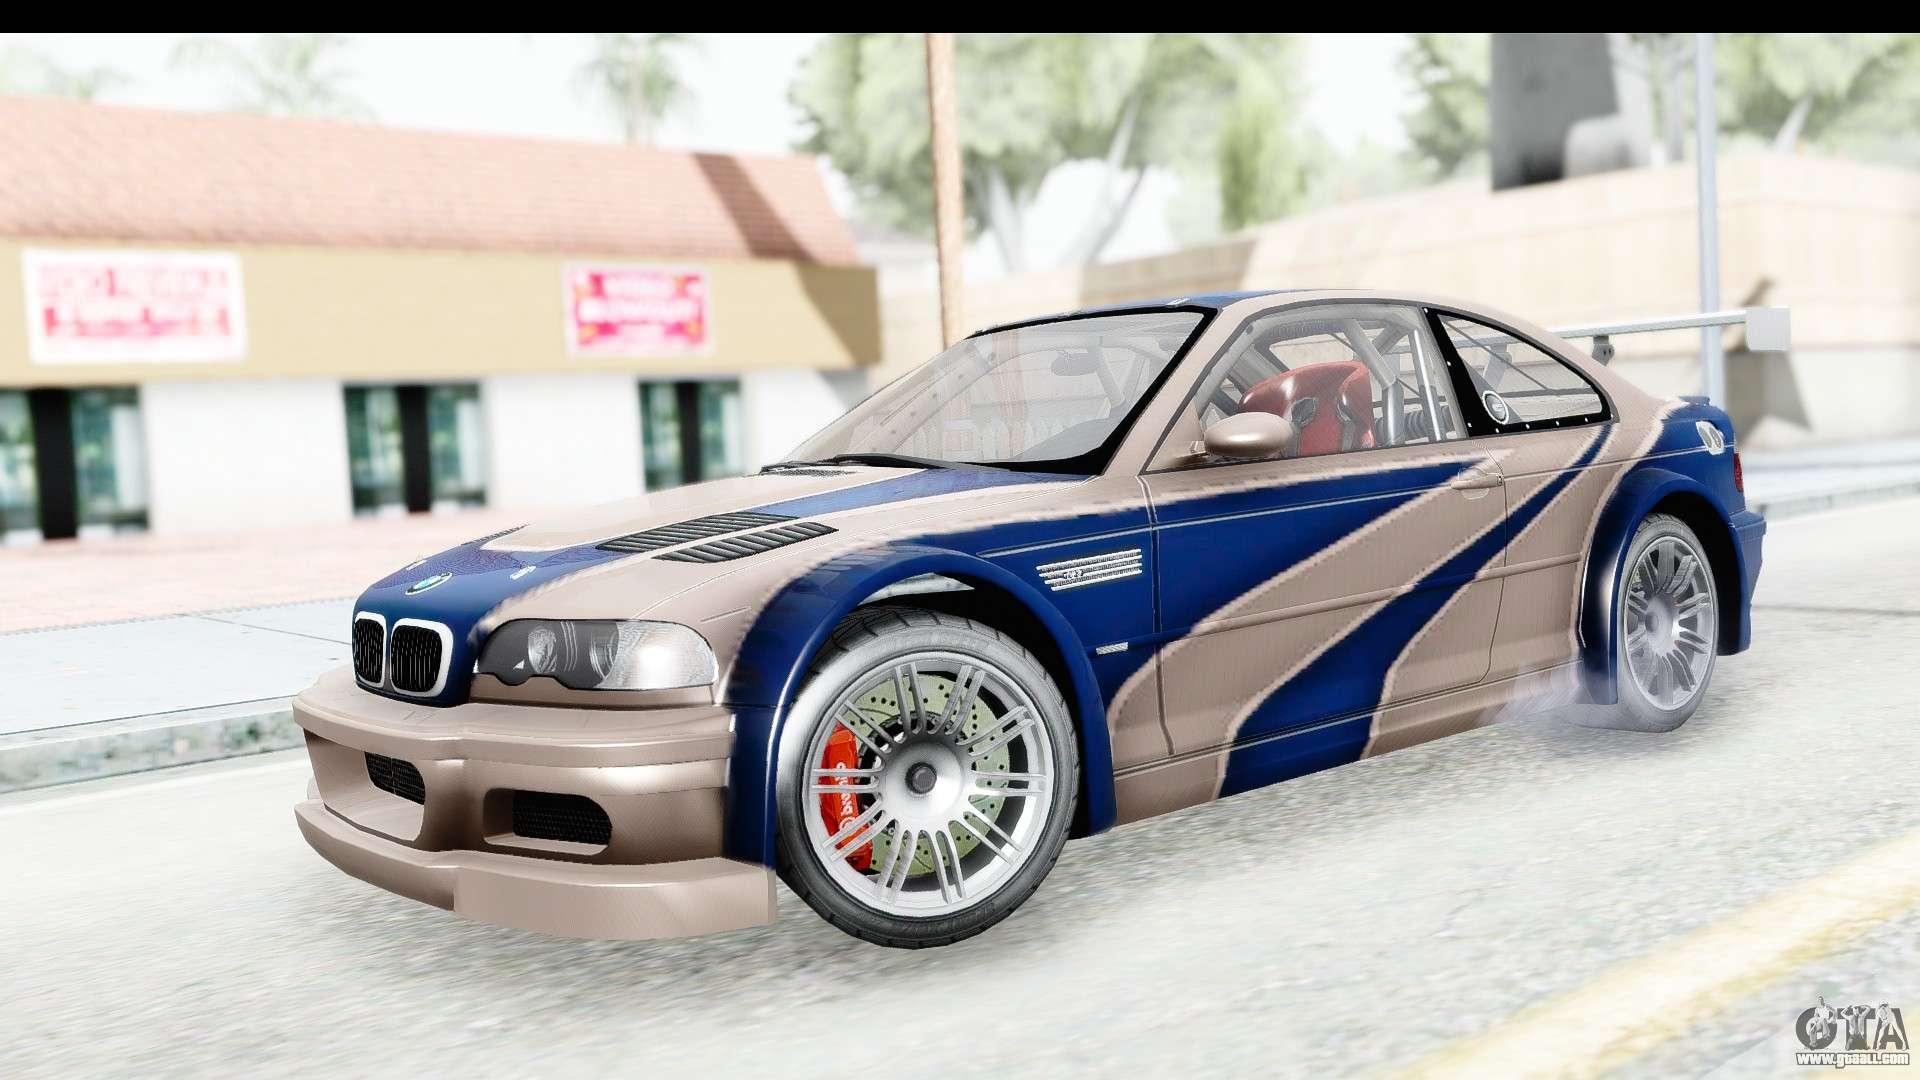 Nfs Carbon Bmw M3 Gtr For Gta San Andreas